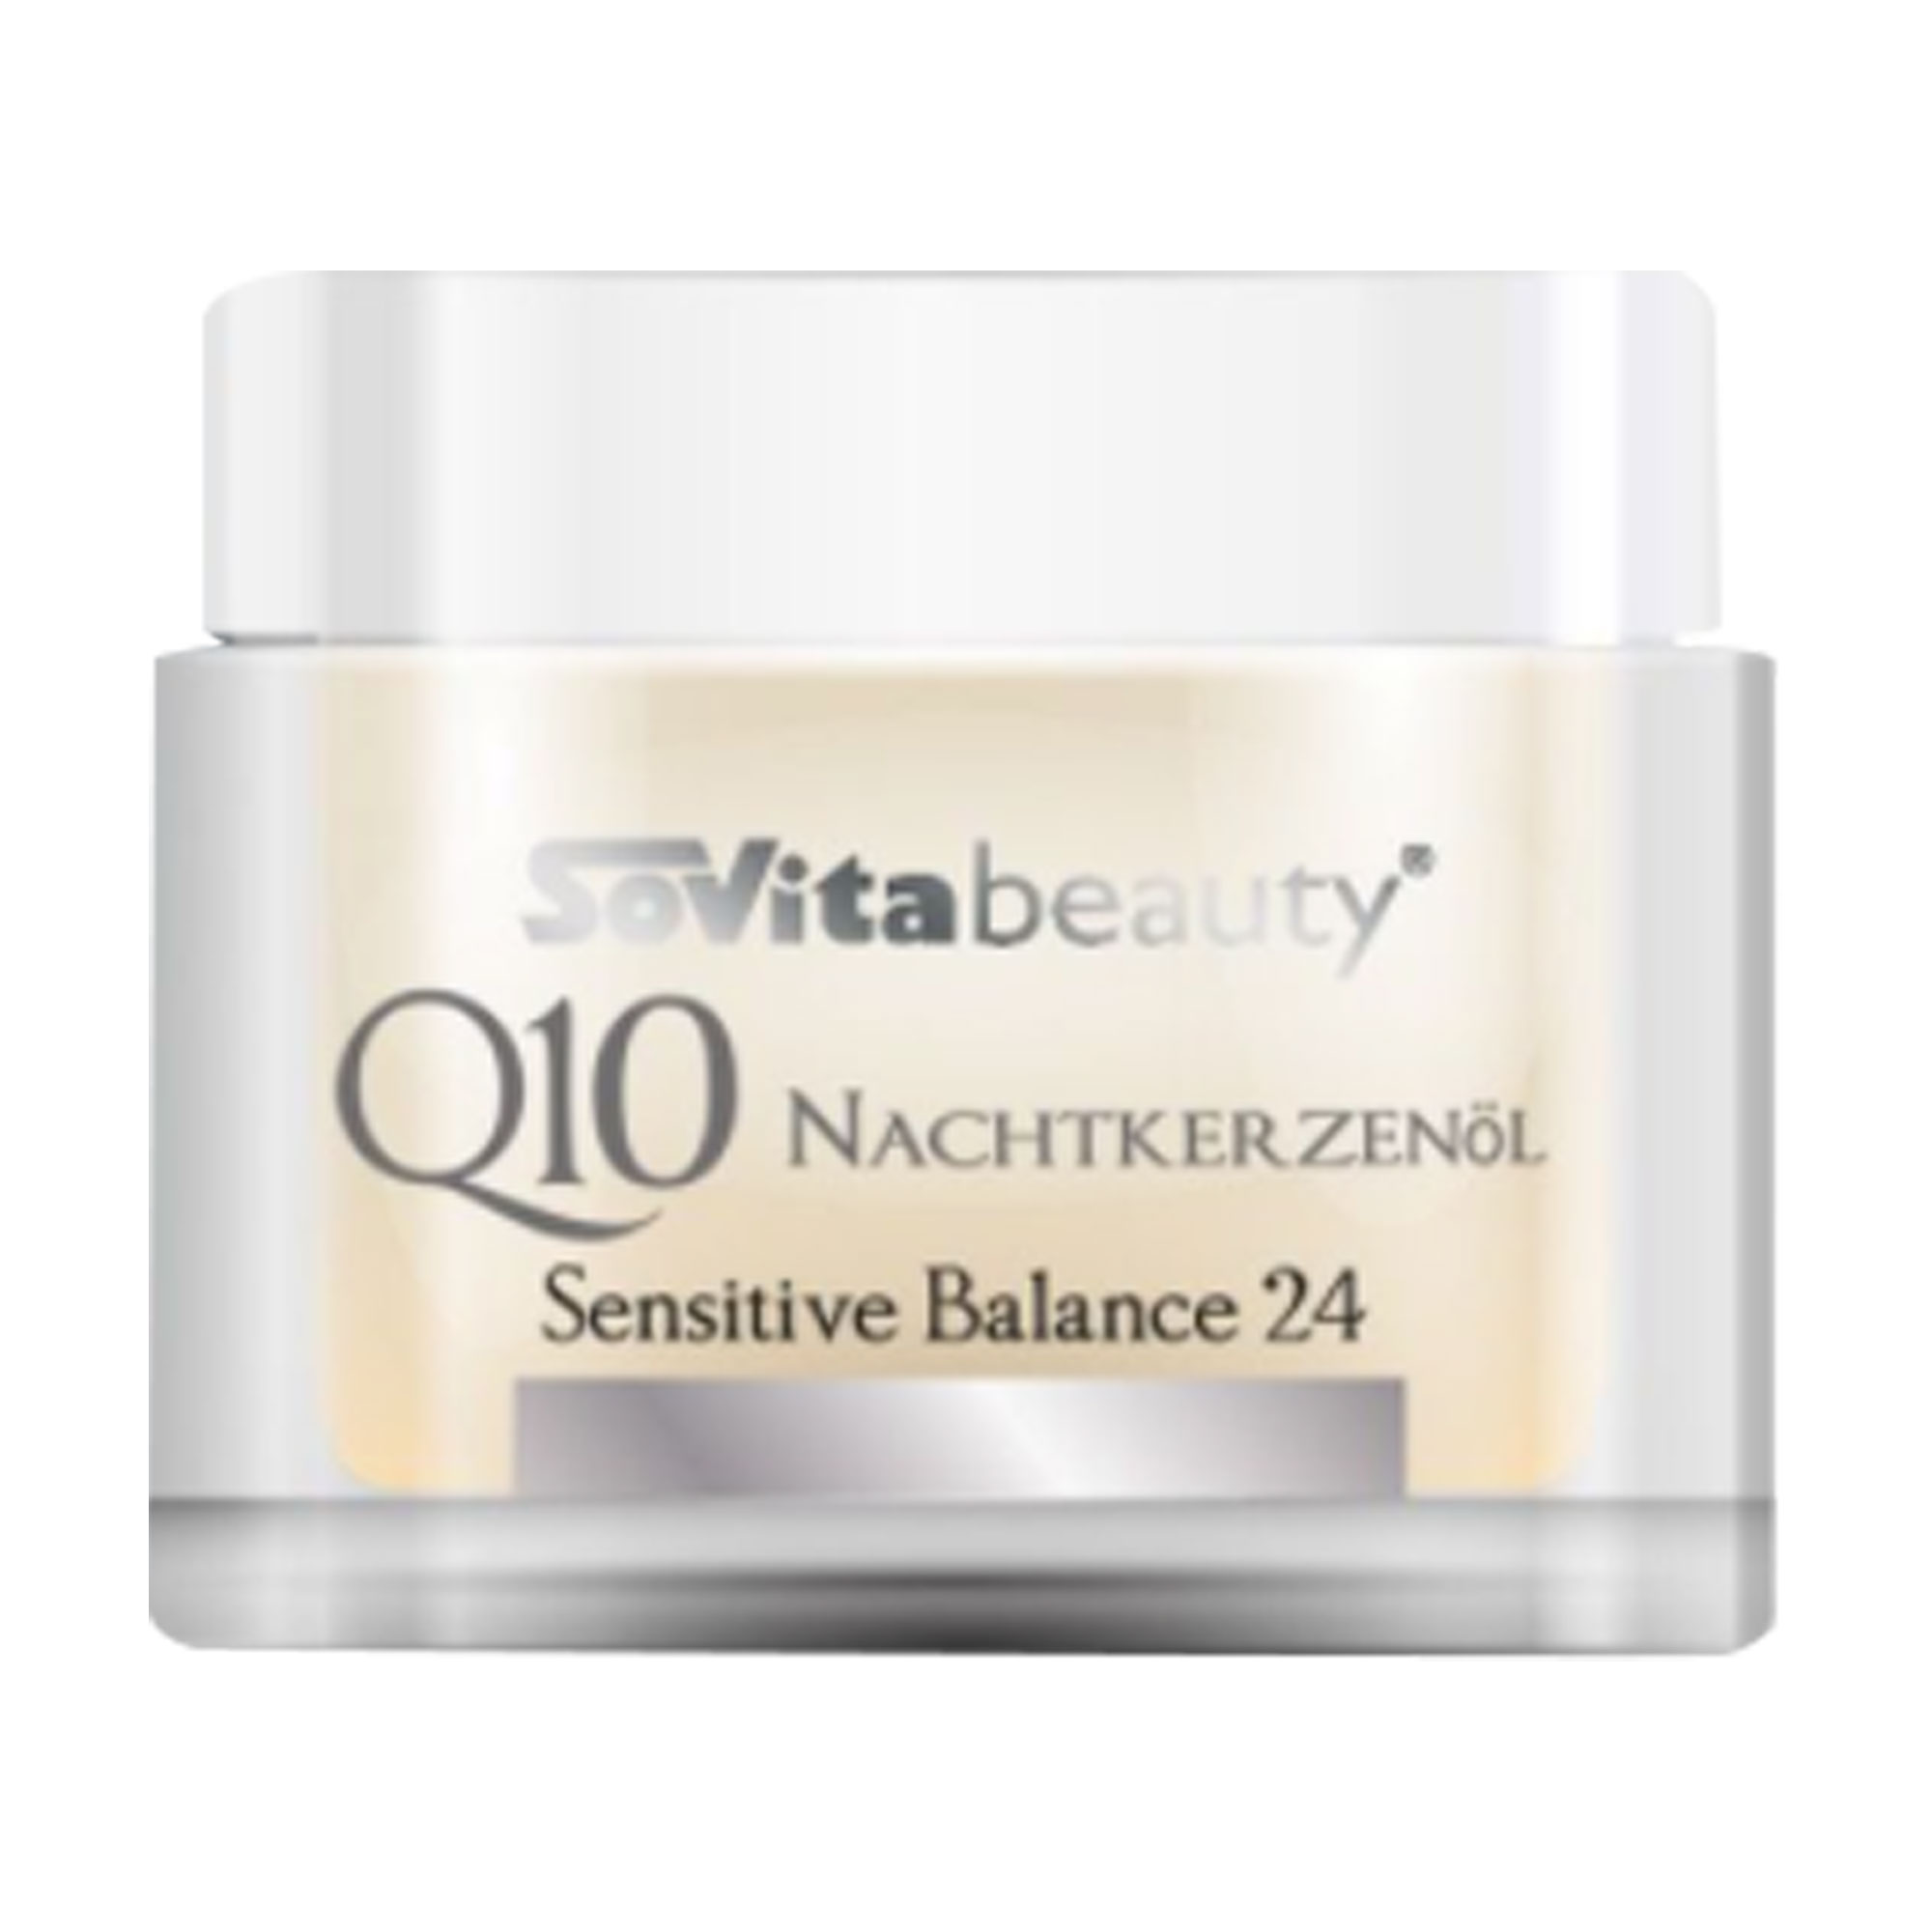 Sovita Beauty Q10 Nachtkerzenöl Creme